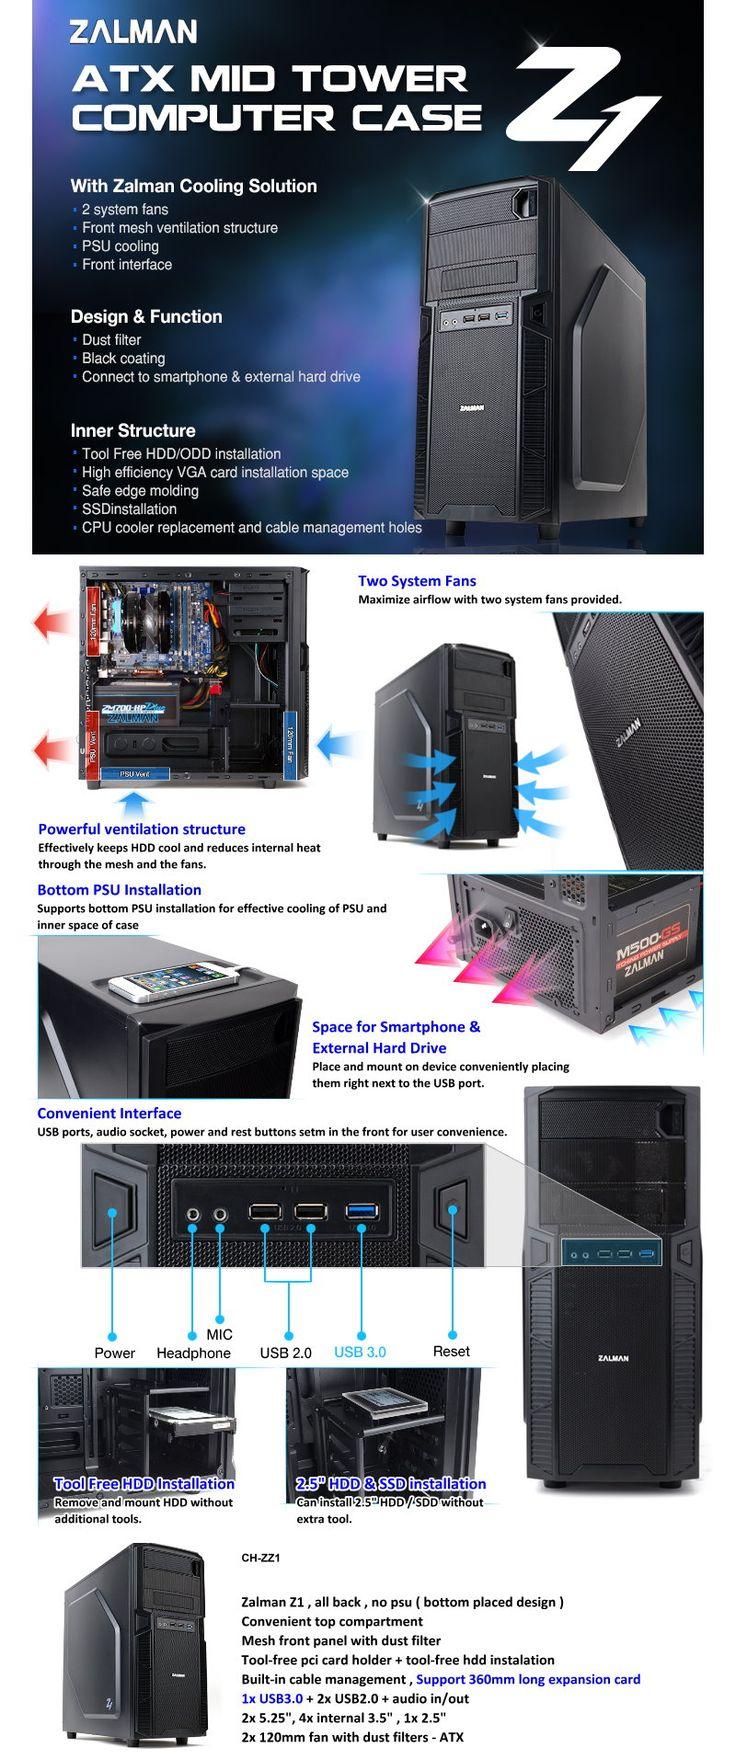 Zalman ATX Mid Tower Computer Case Z1